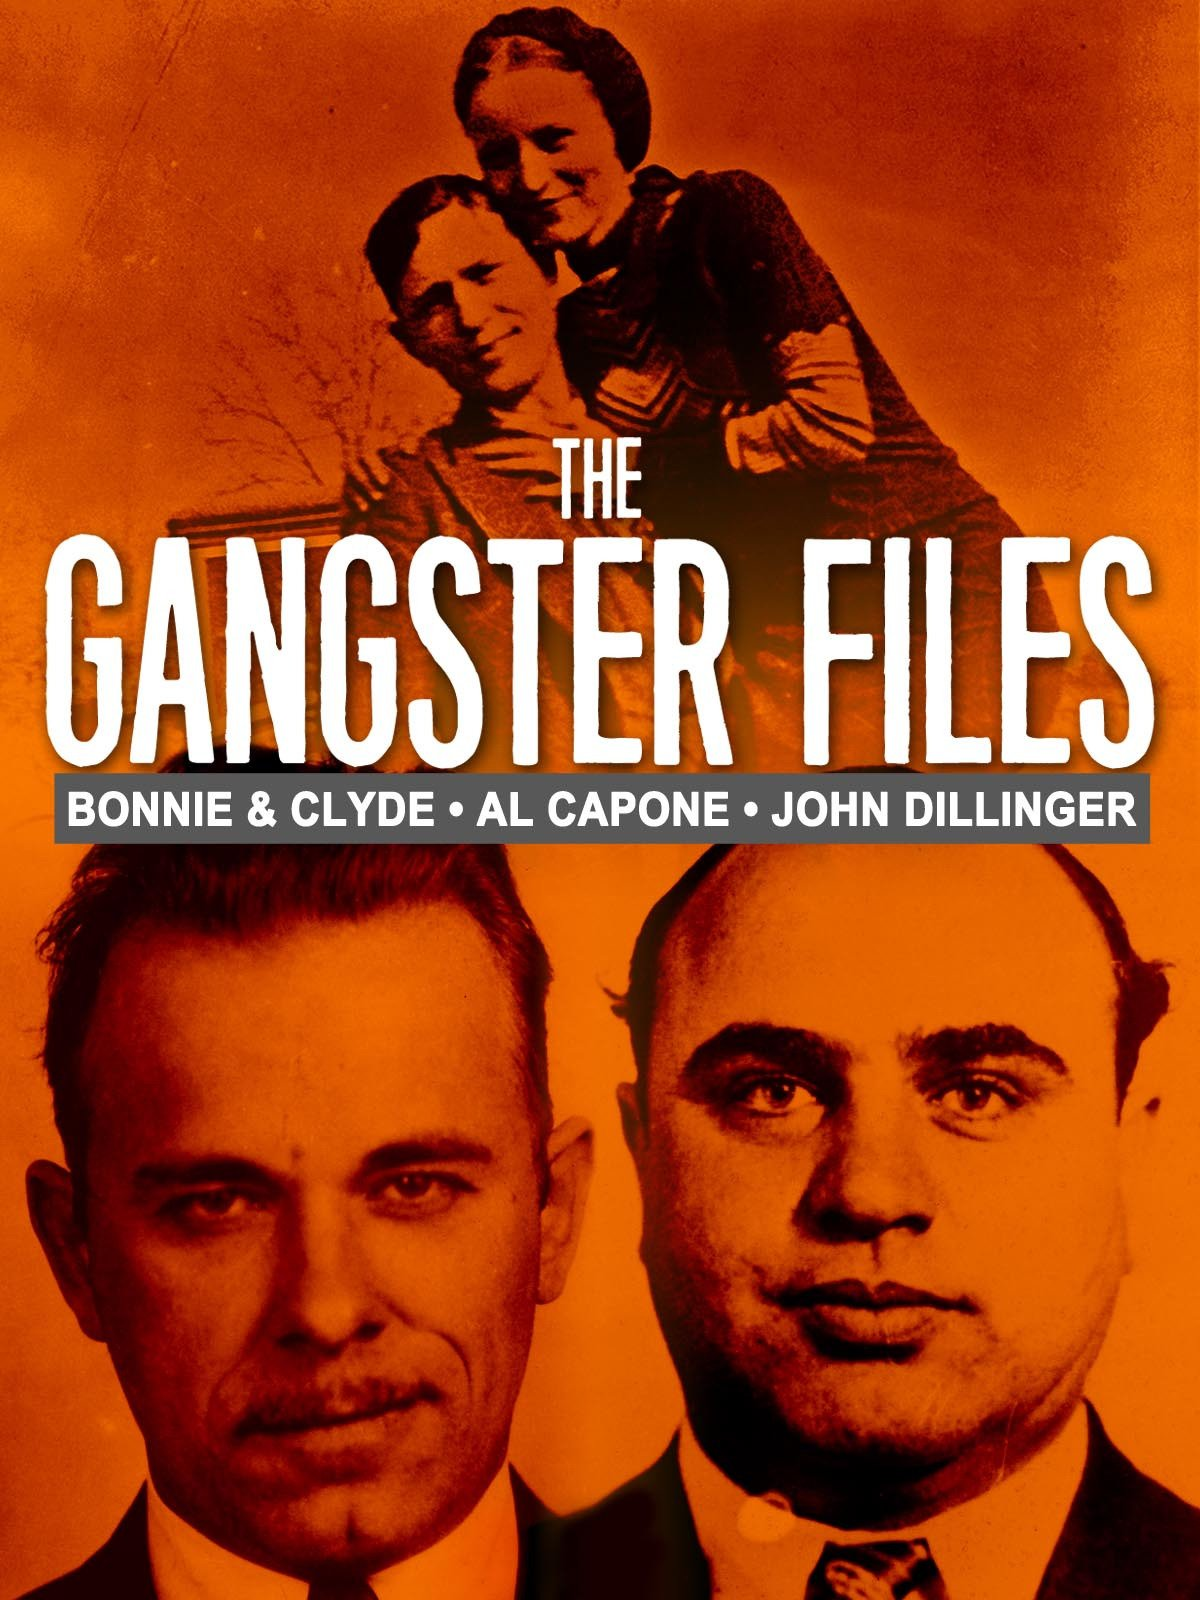 The Gangster Files: Bonnie & Clyde, Al Capone, John Dillinger